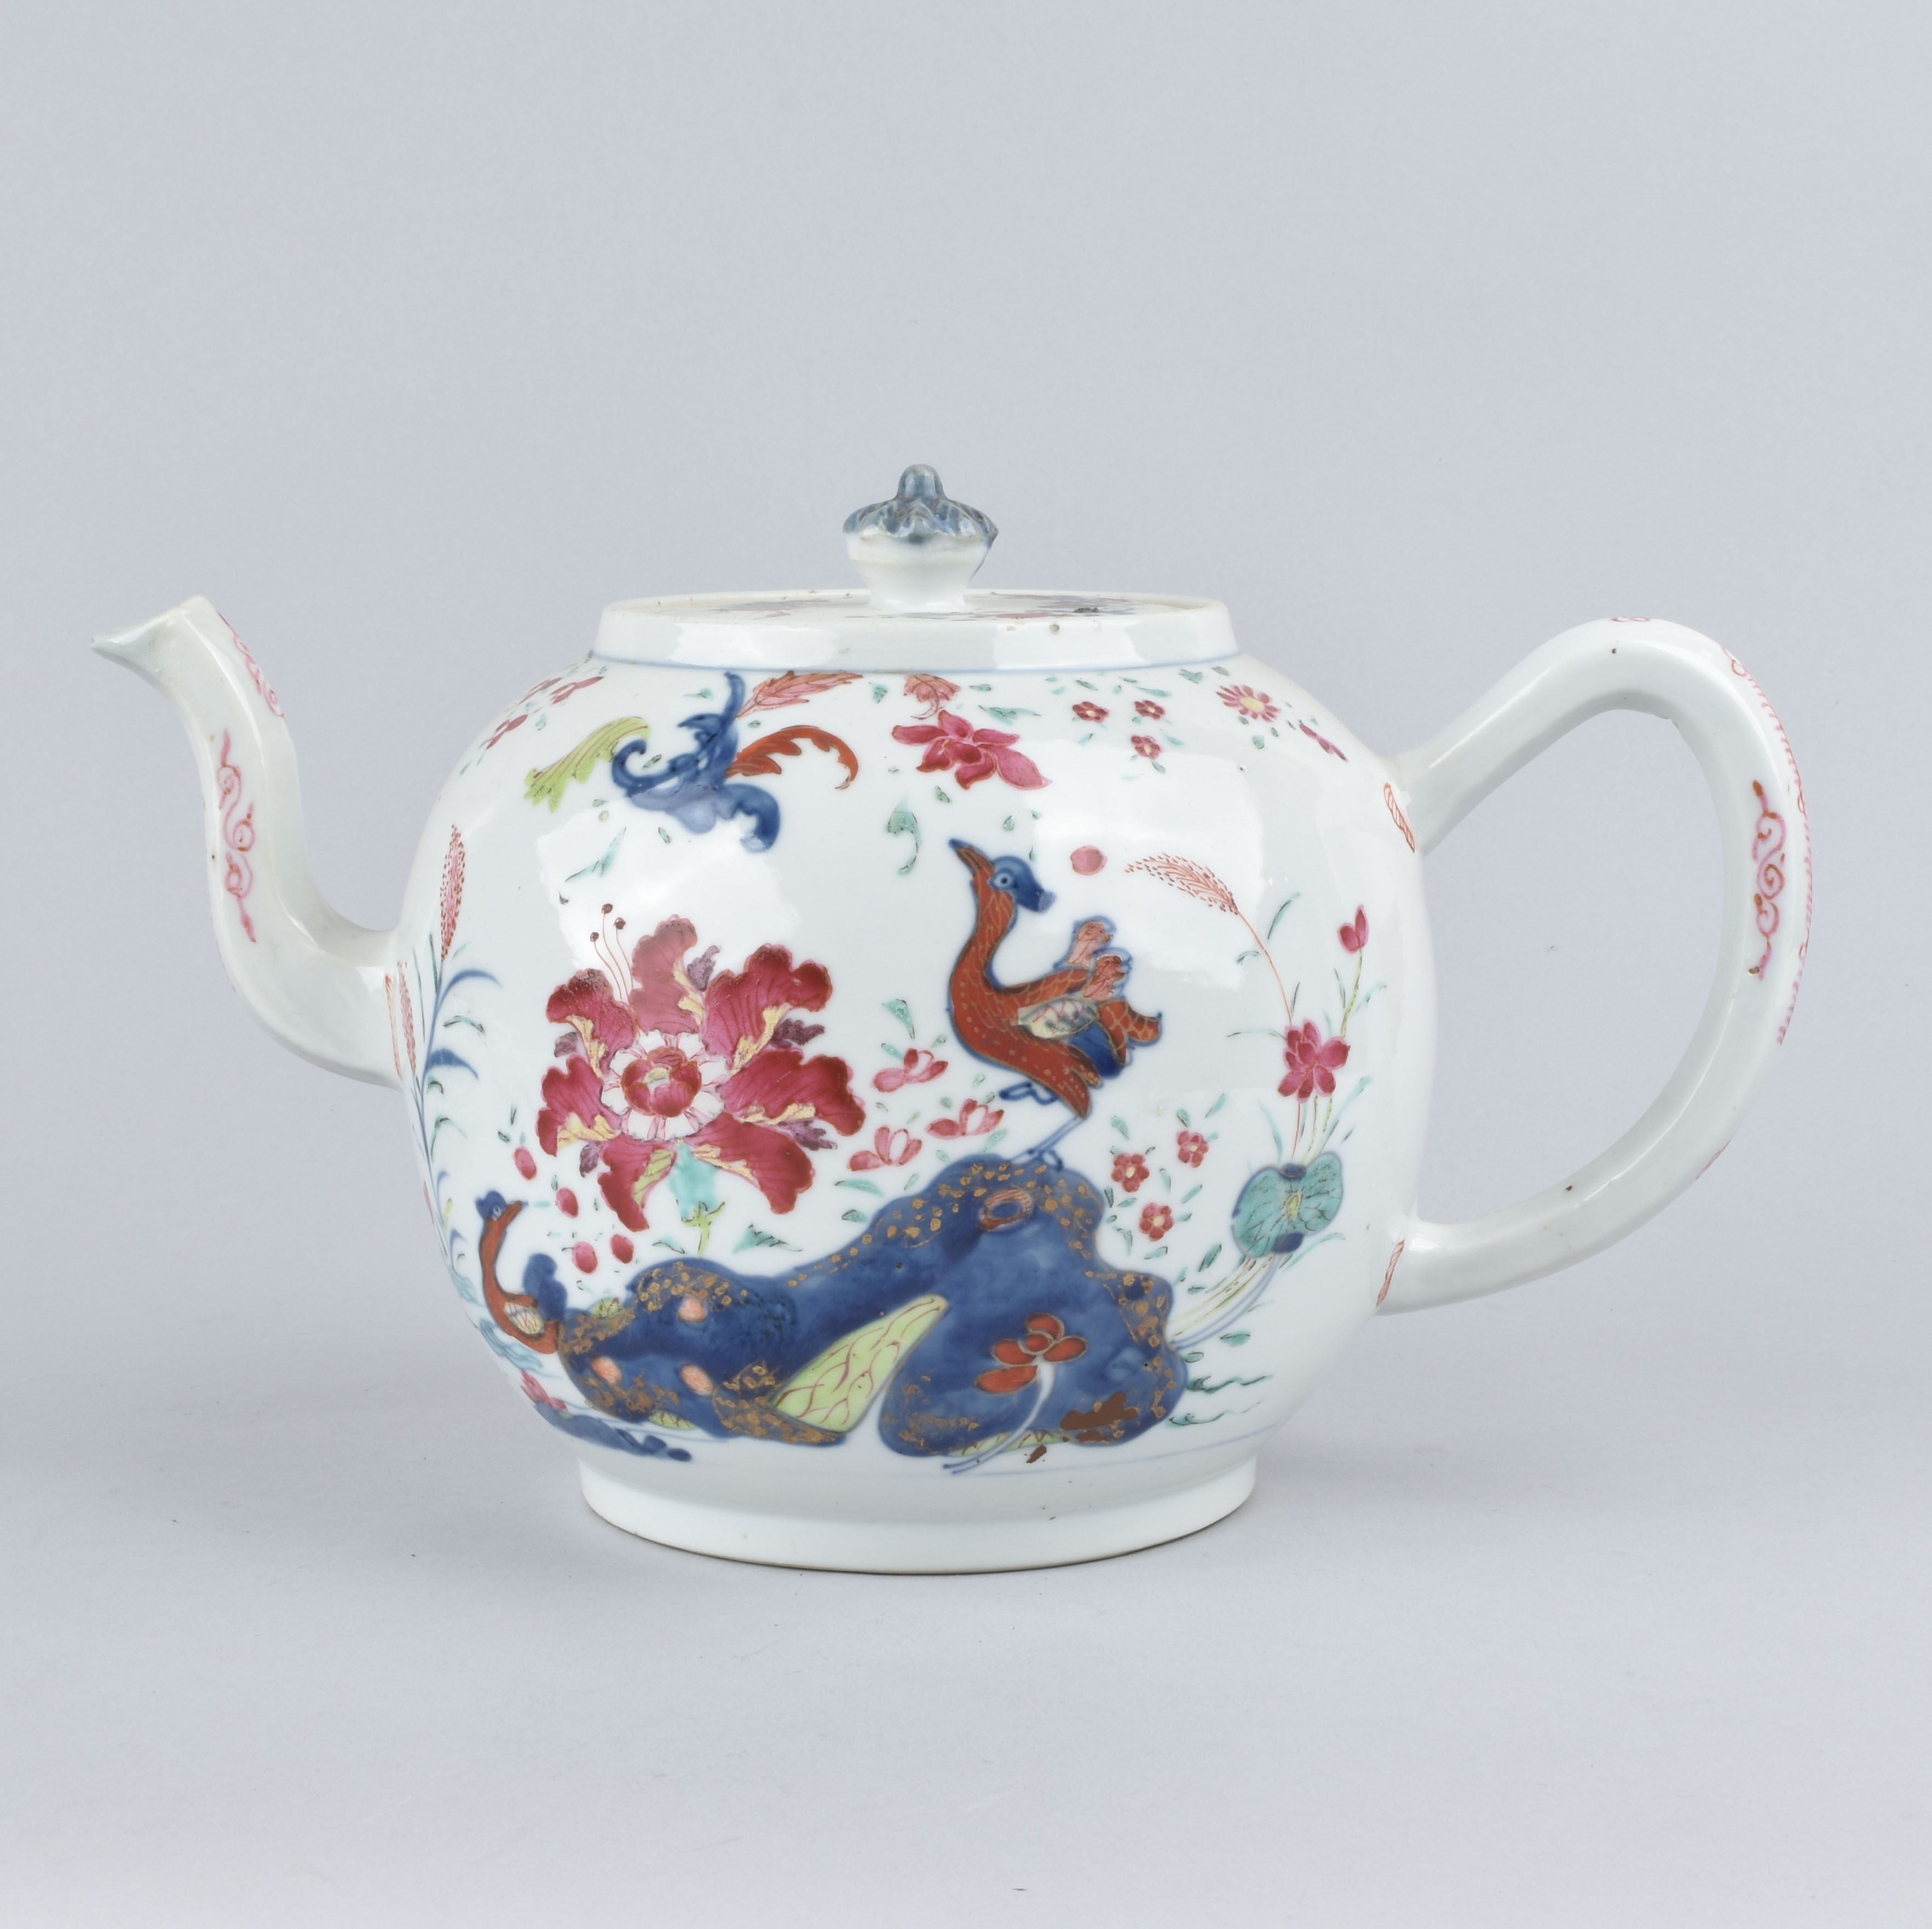 Porcelaine Qianlong (1735-1795), circa 1750-60, Chine